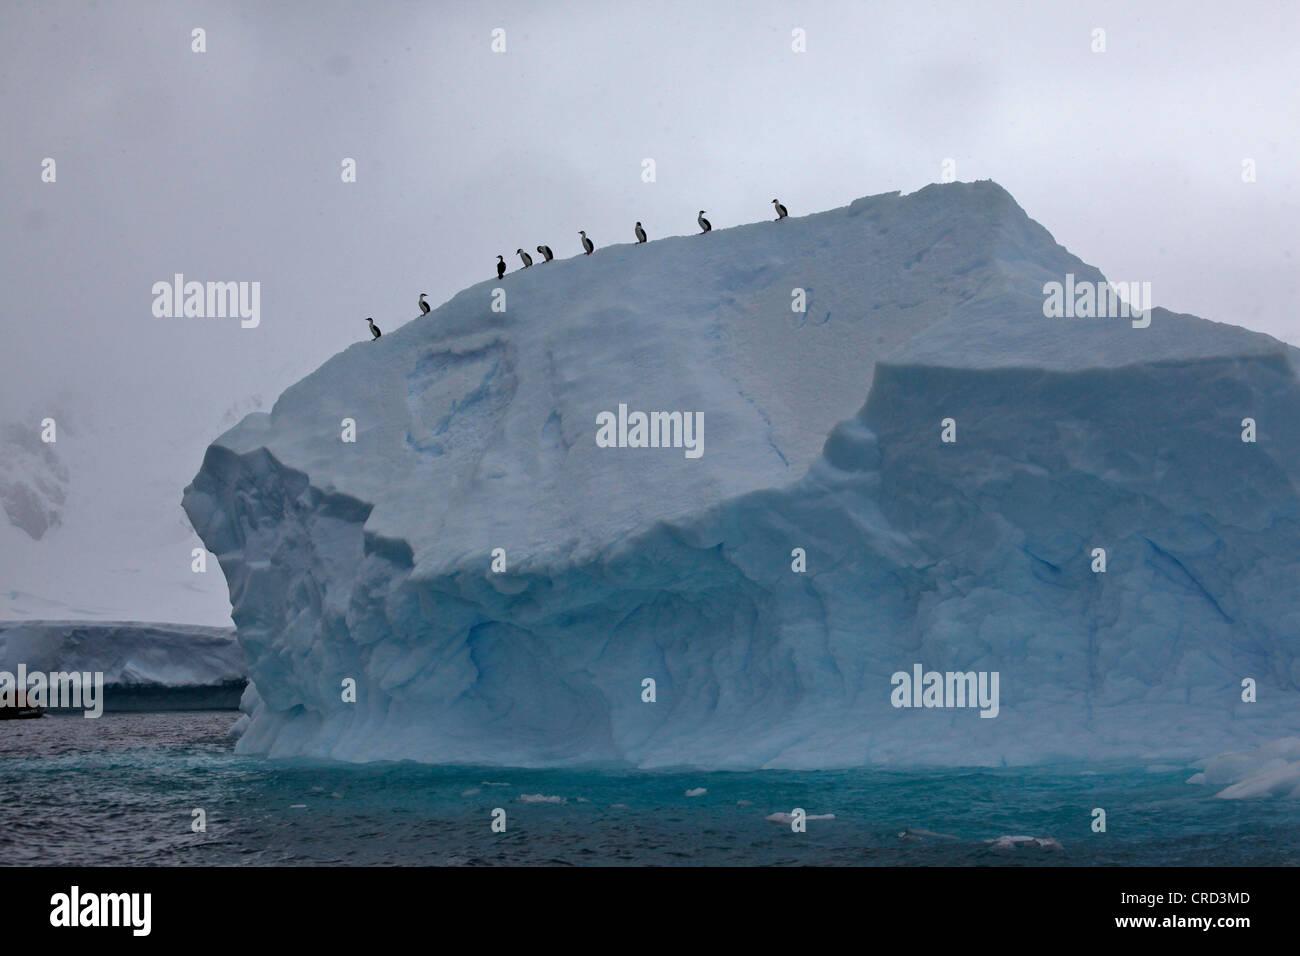 ice berg, antarctica - Stock Image